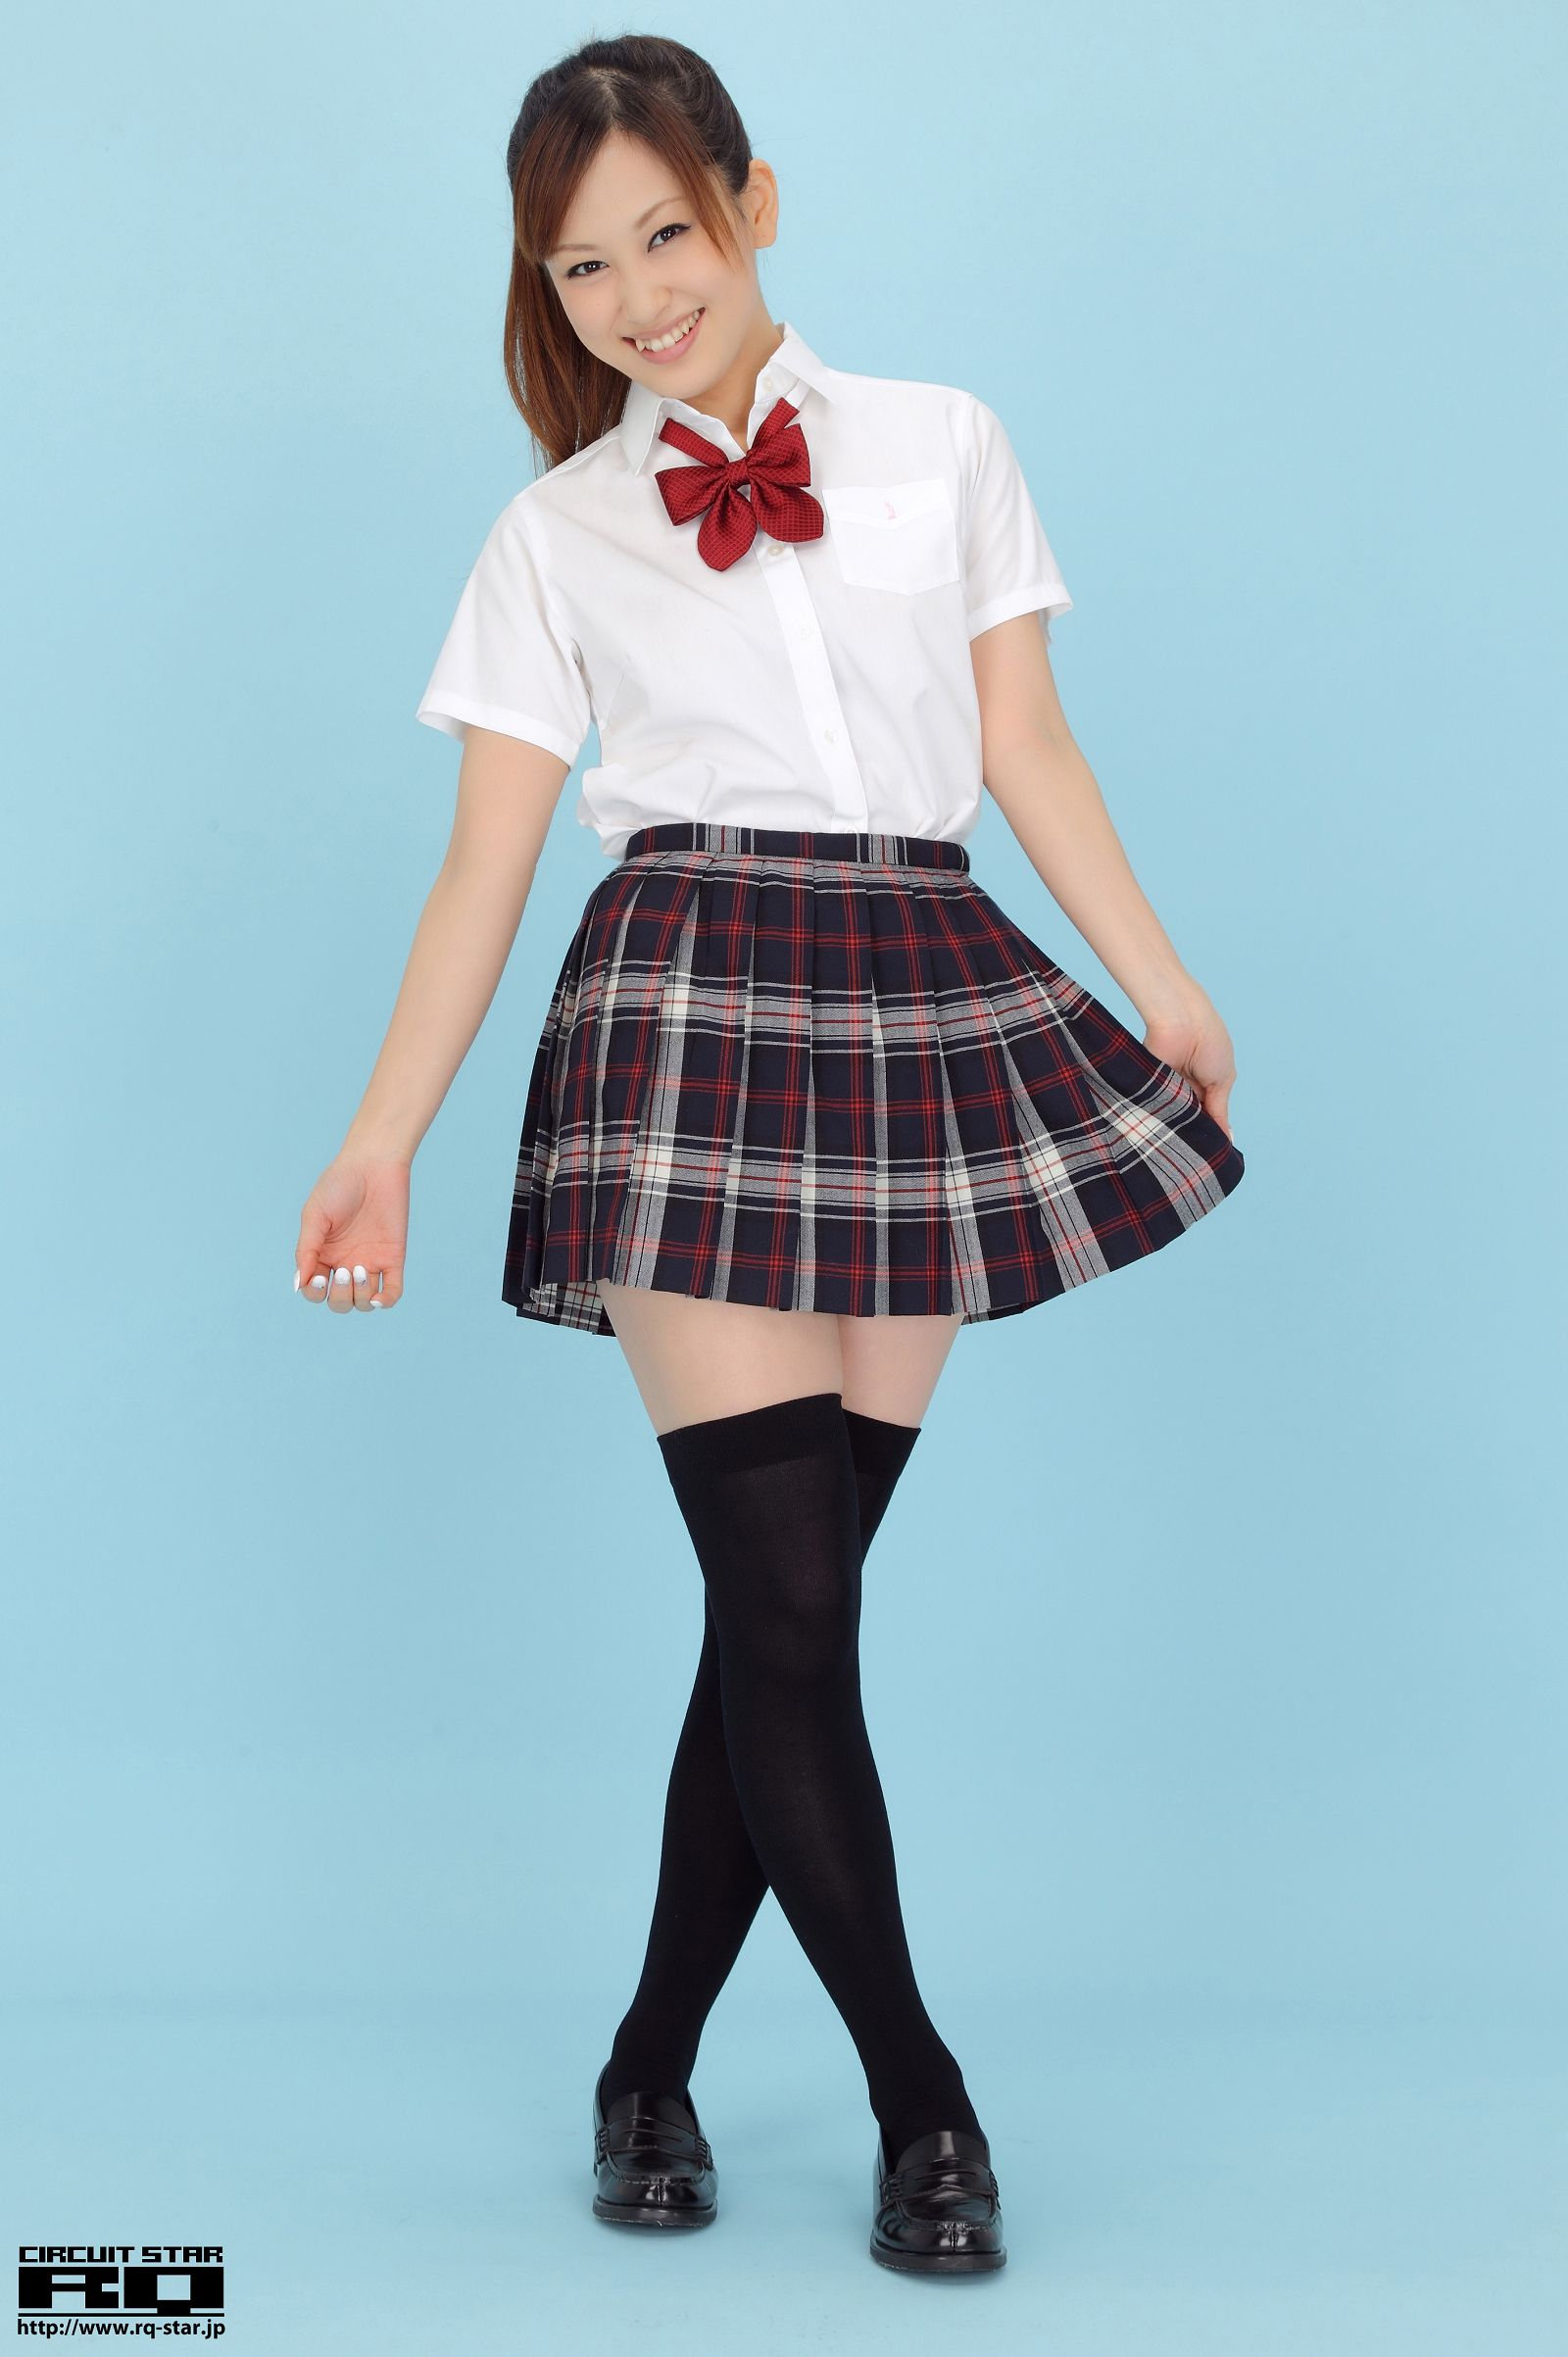 [RQ STAR美女] NO.00602 Chieri Aoba 青葉ちえり School Girl[150P] RQ STAR 第1张